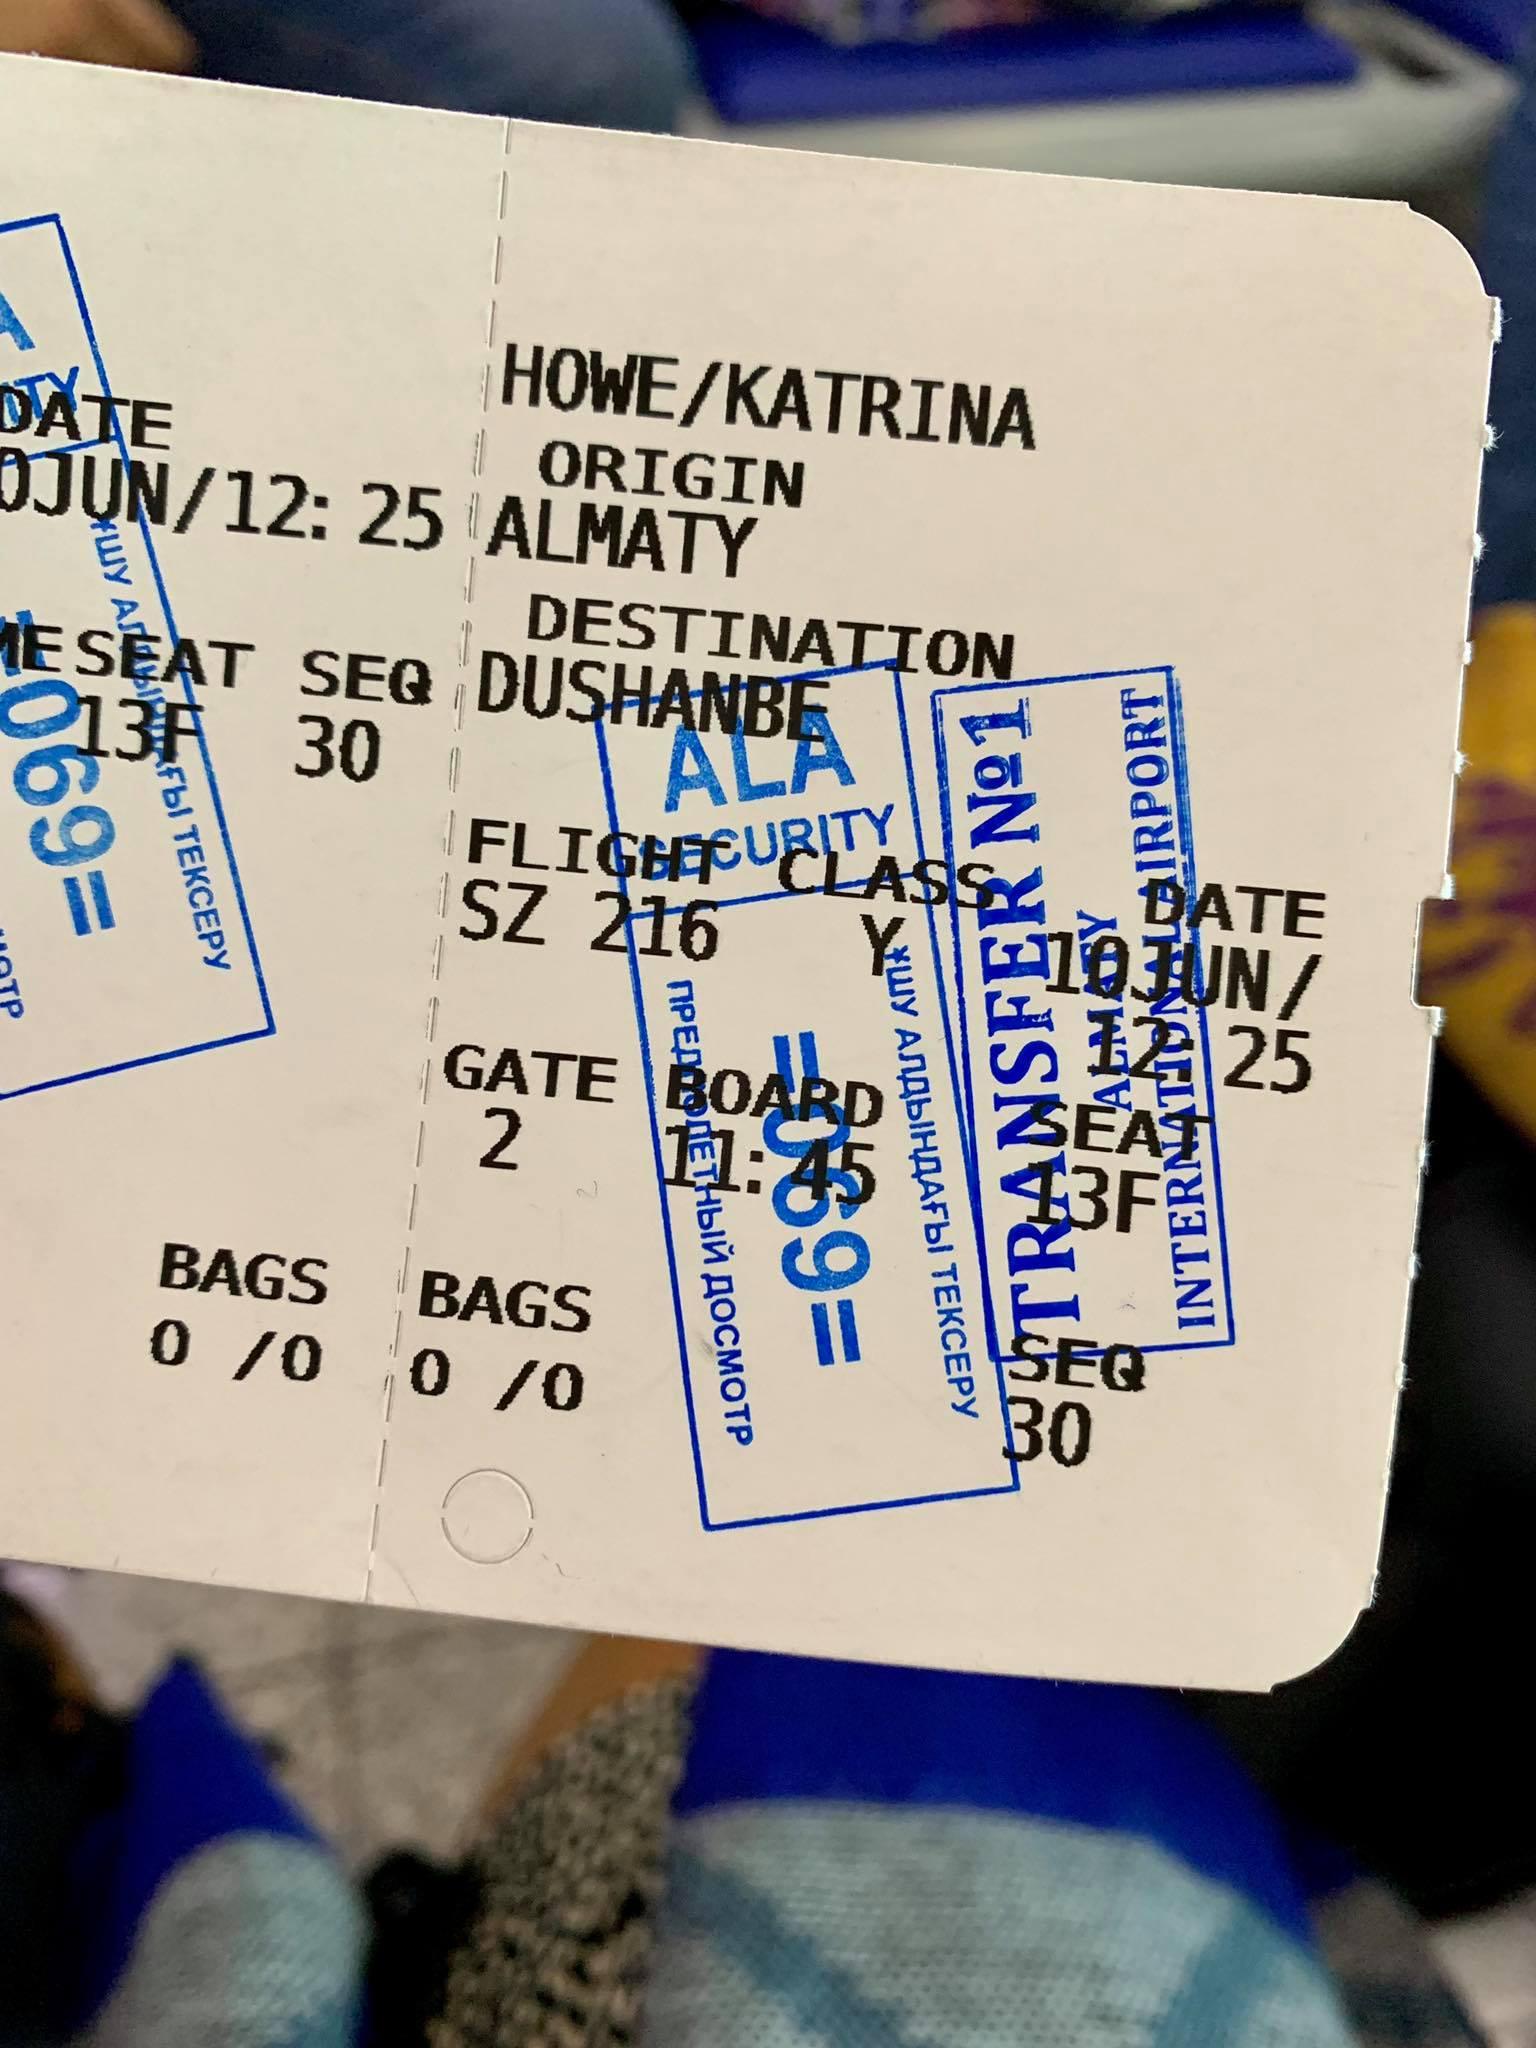 Kach Solo Travels in 2019 I just arrived in Dushanbe, Tajikistan23.jpg